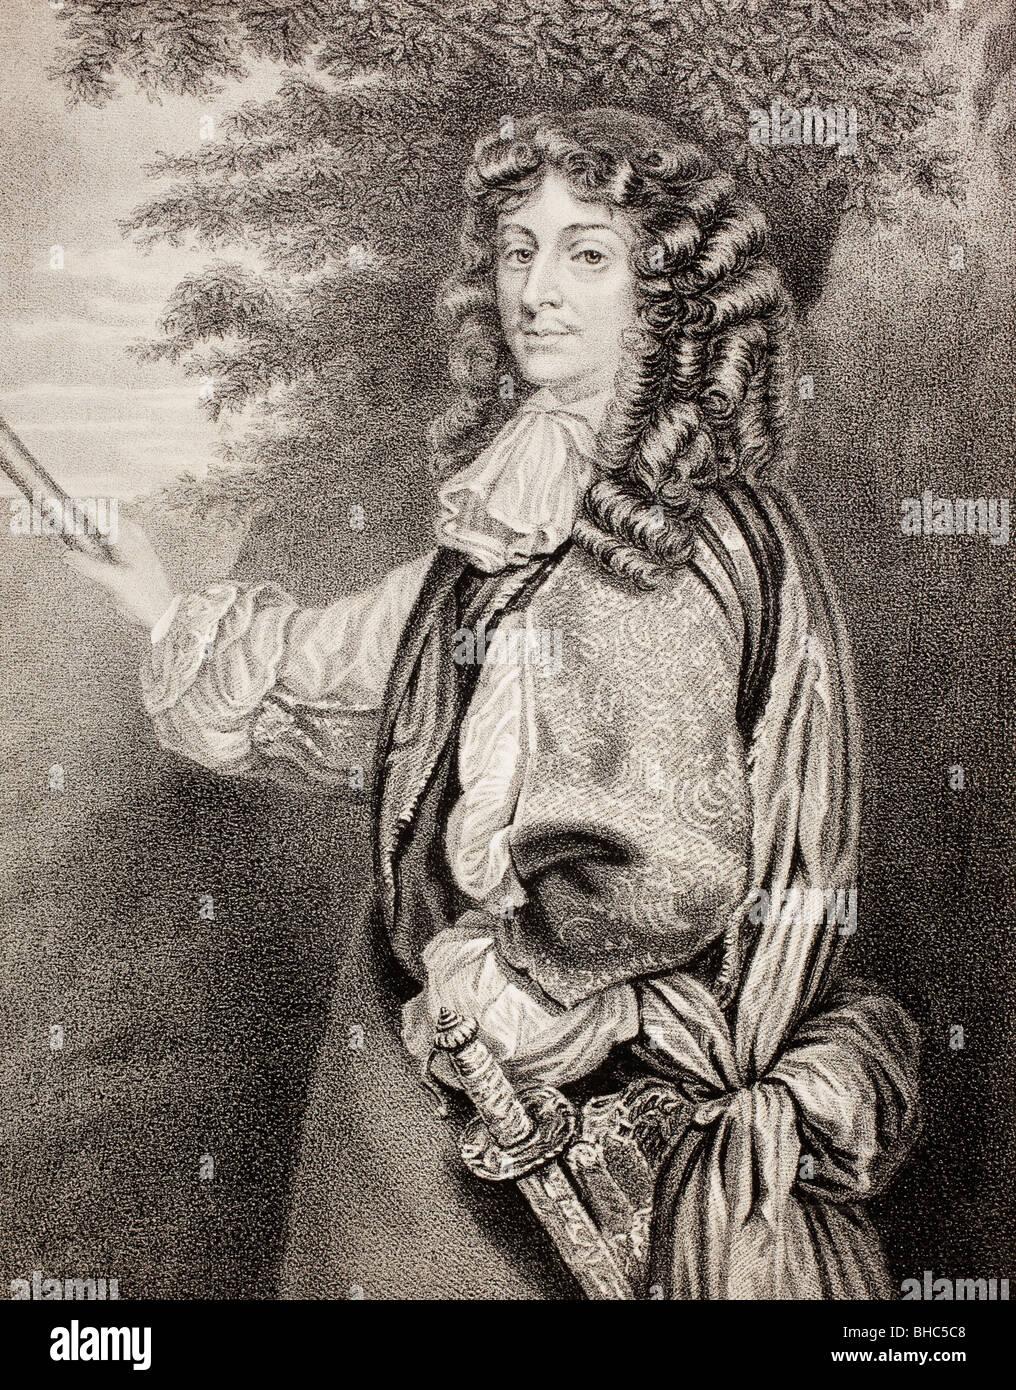 David Leslie, Lord Newark c. 1600-1682. General in English Civil War and Scottish Civil Wars. - Stock Image